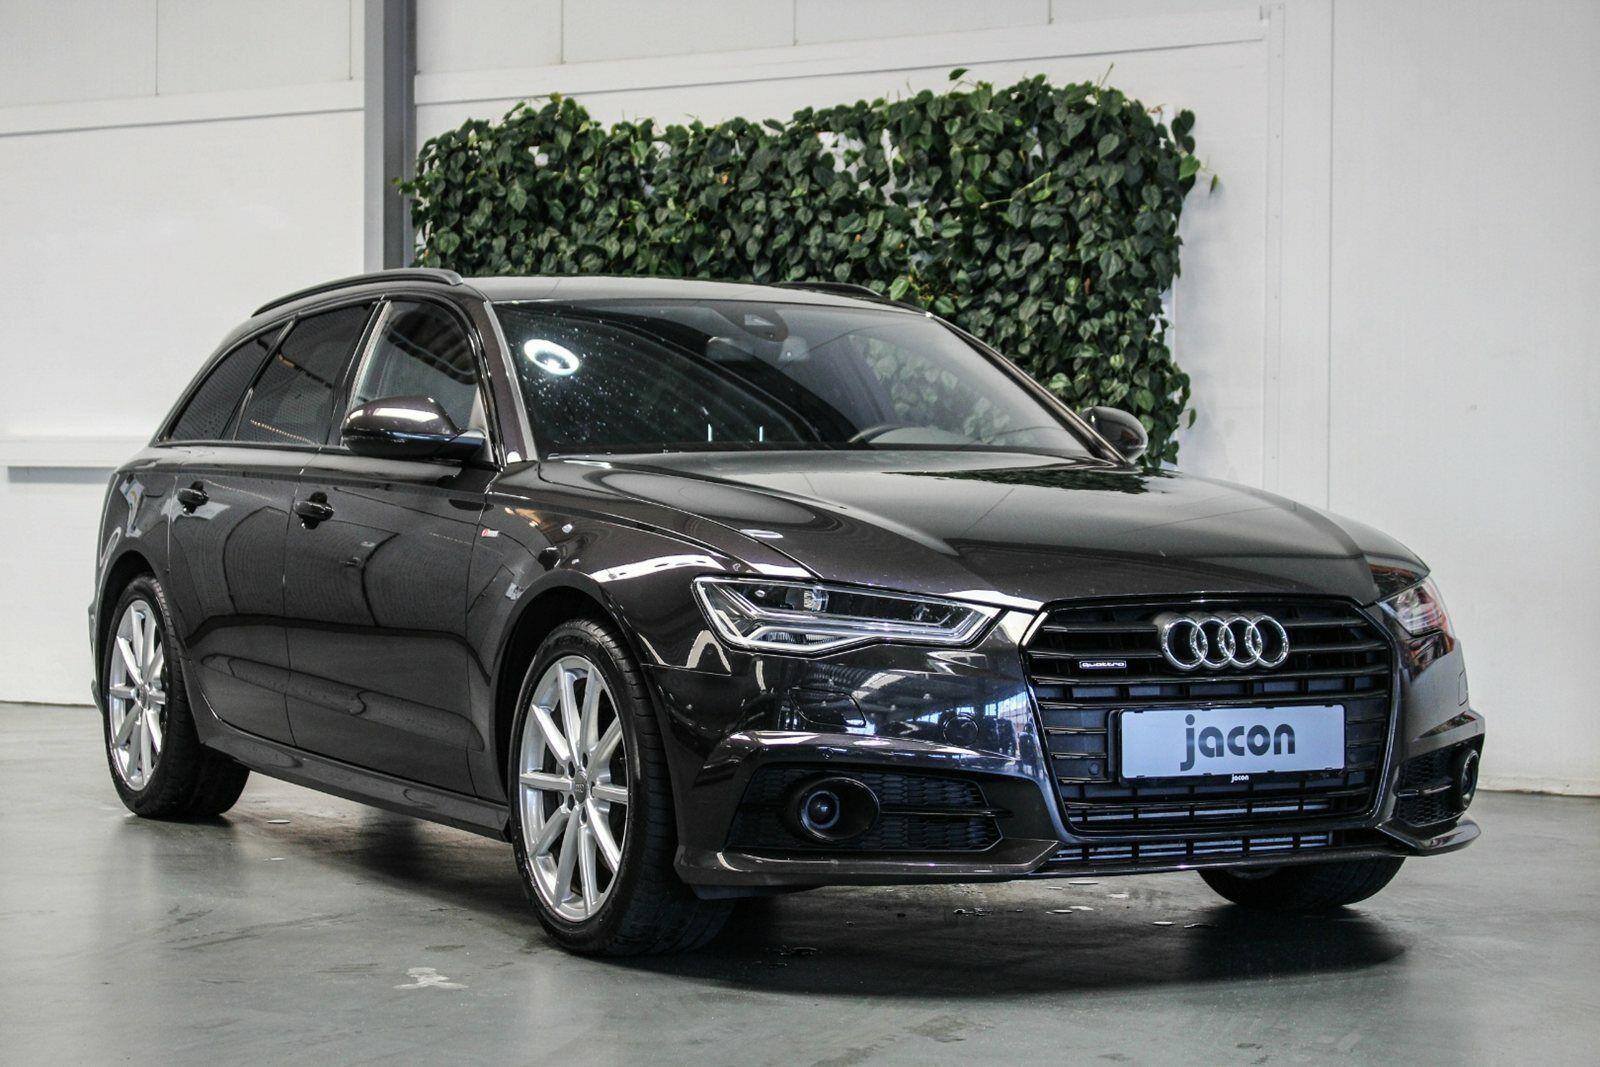 Audi A6 3,0 TDi 218 S-line Avant quat S-tr 5d - 539.900 kr.